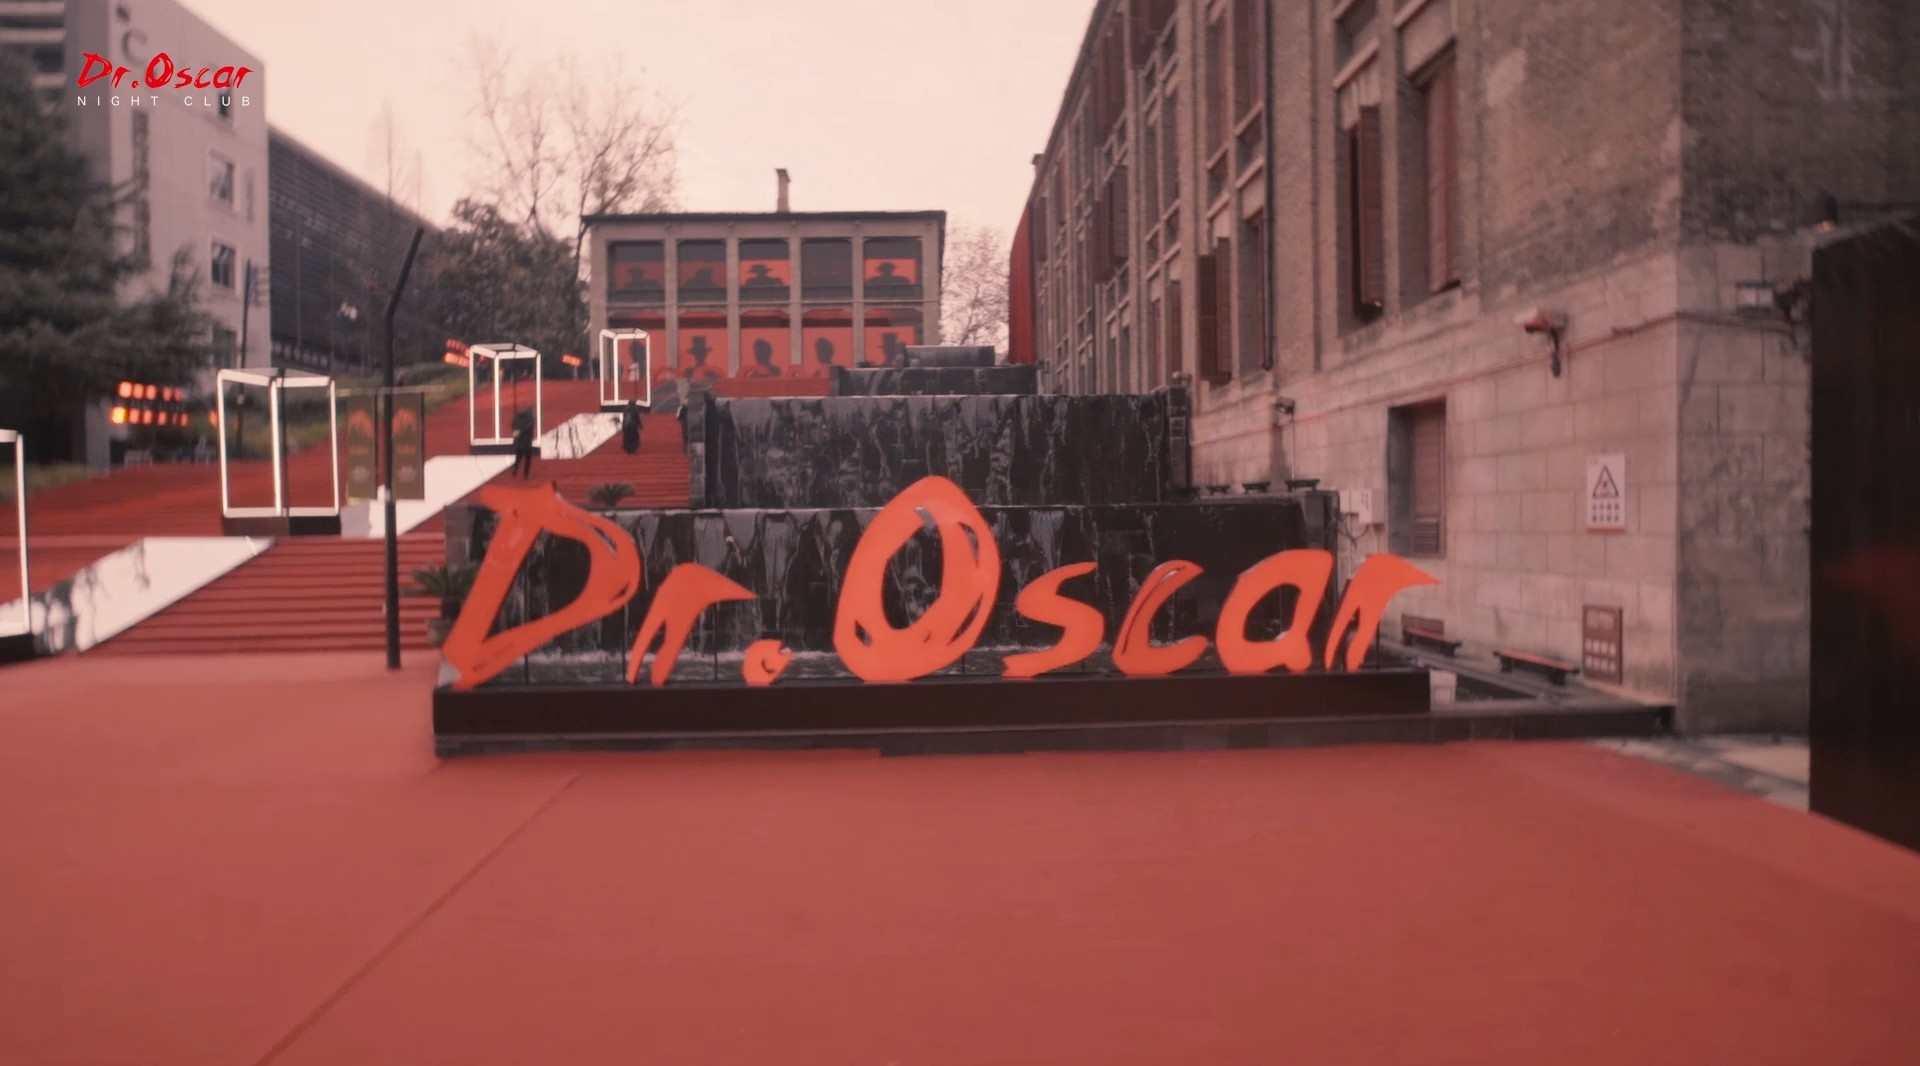 Dr.Oscar品牌发布盛会  惊艳芜湖